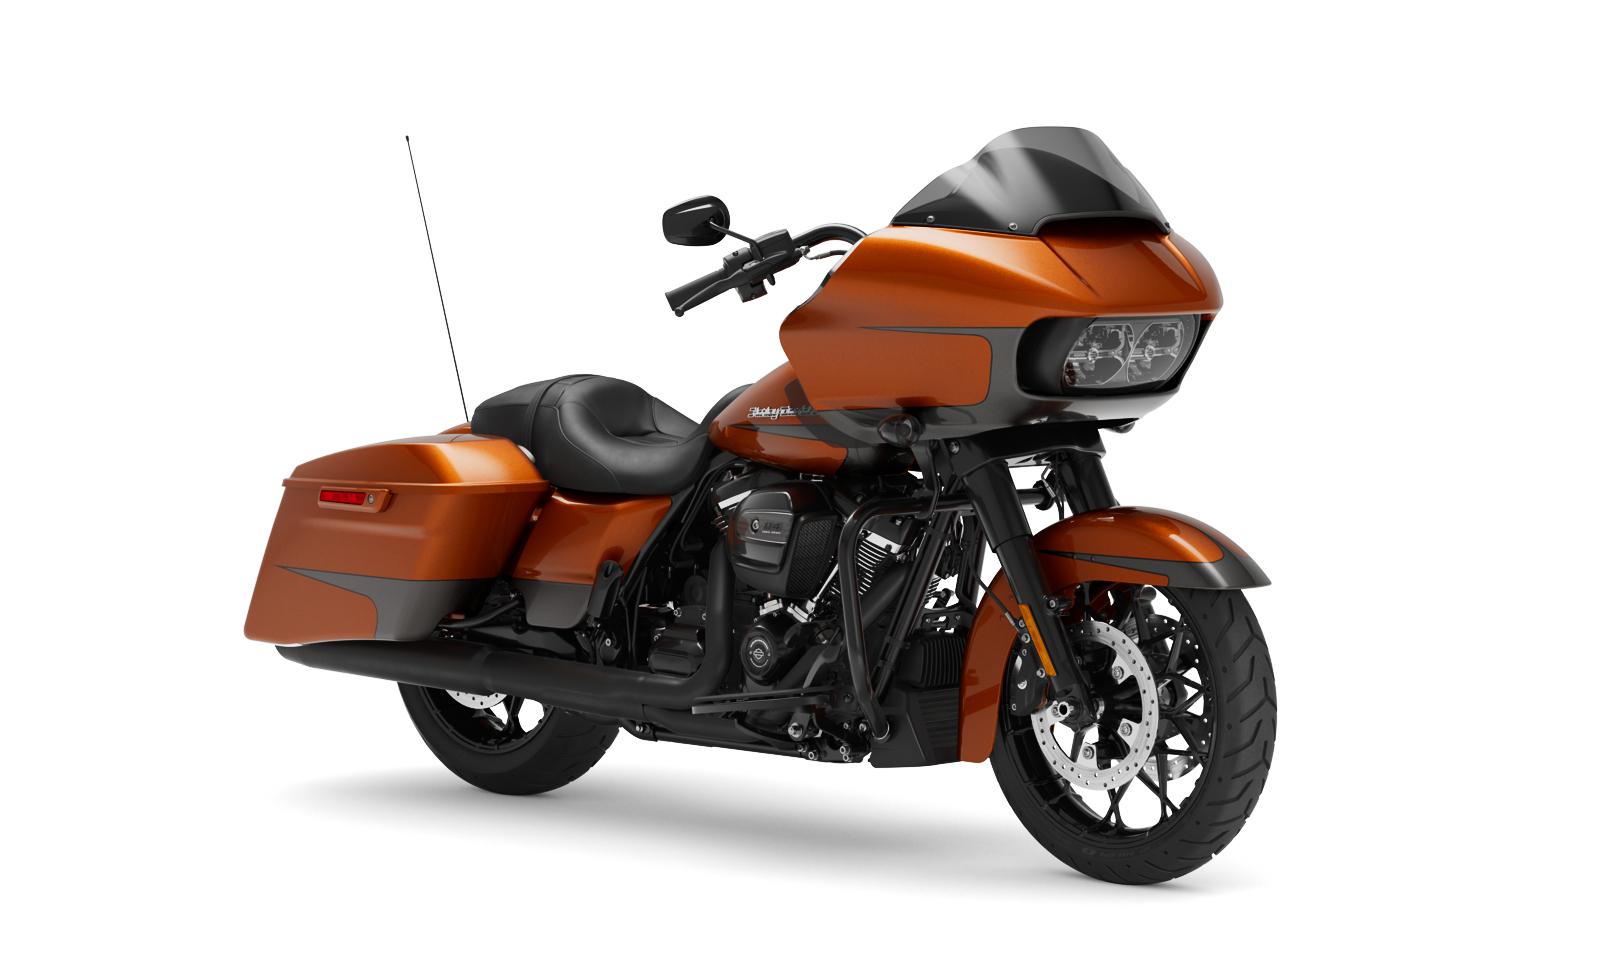 2020 Road Glide Special Motorcycle Harley Davidson Brasil